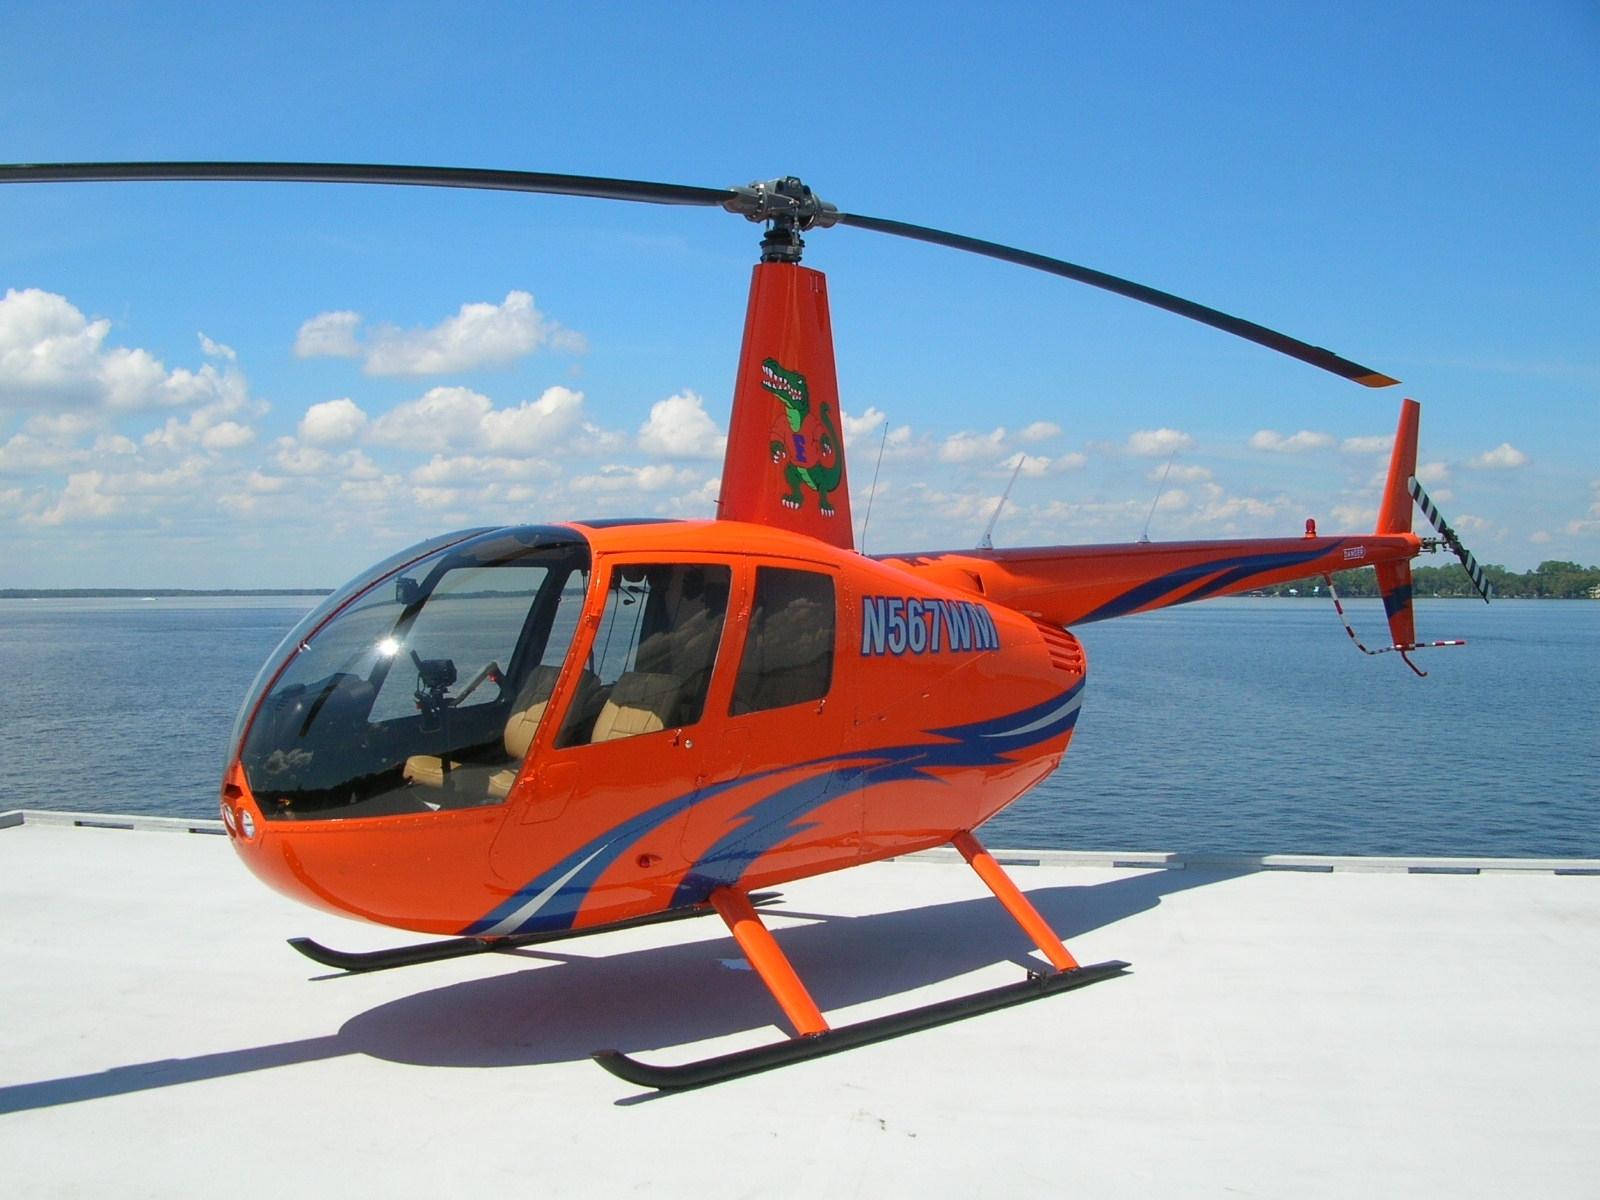 Hélicoptère orange